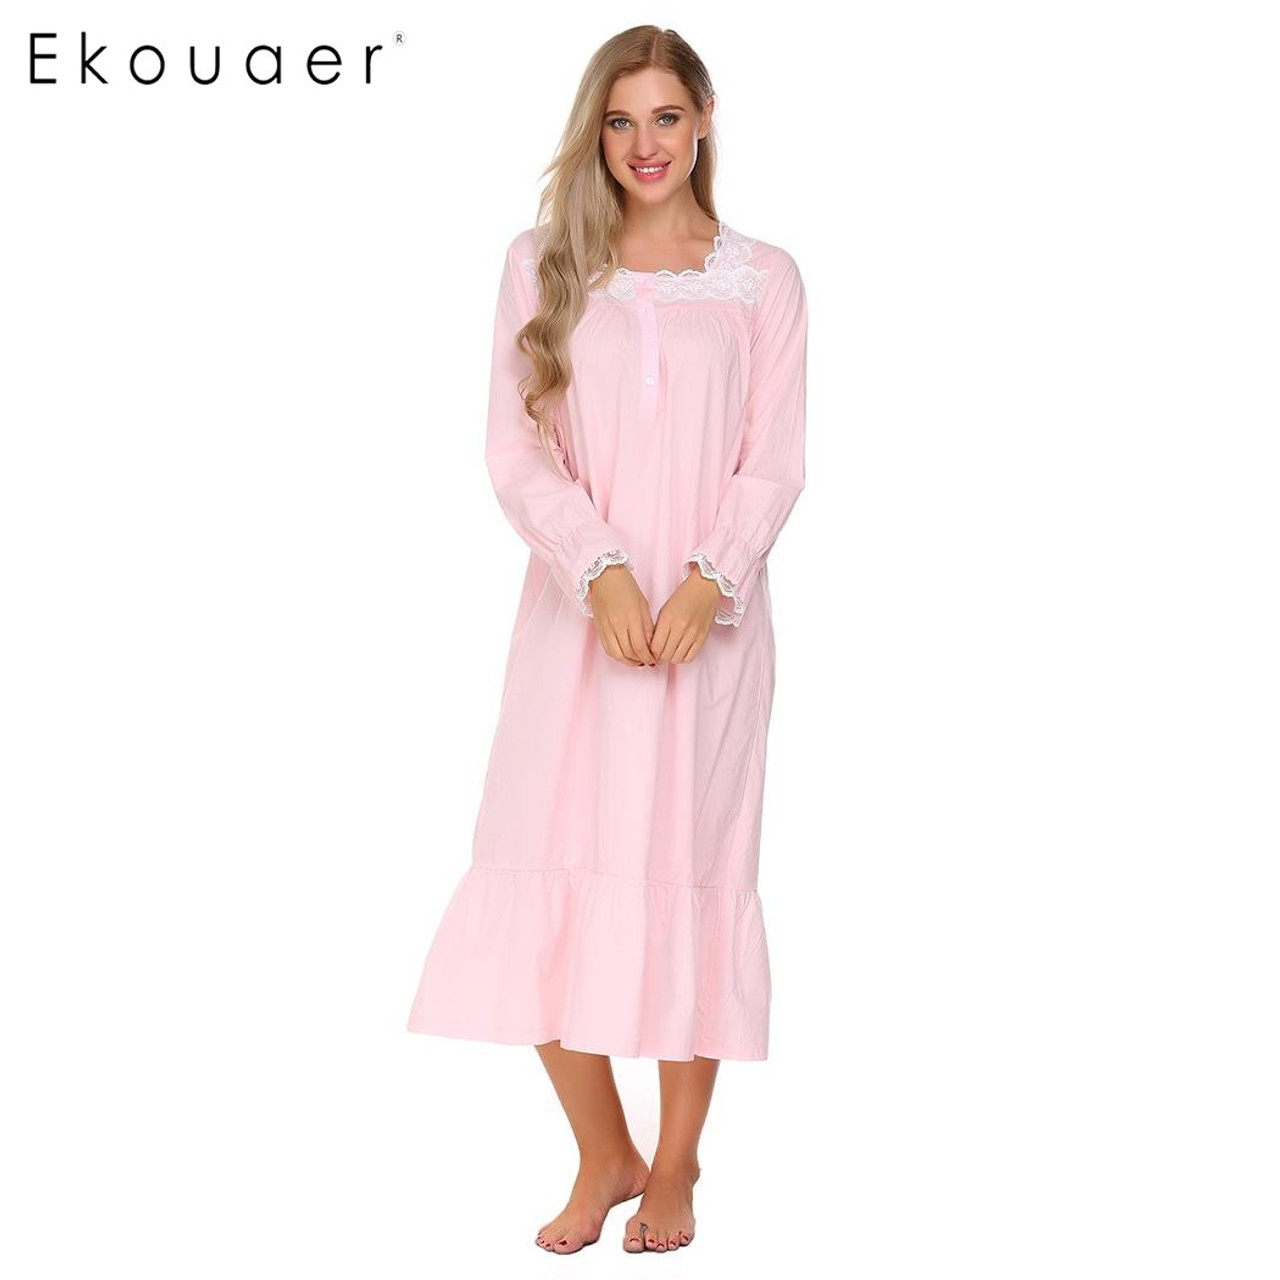 f4d9743468 ... Ekouaer Elegant Solid Nightwear Womens Victorian Long Sleeve Sleepwear  Lace Patchwork Ruffled Hem Nightgown Plus Size ...